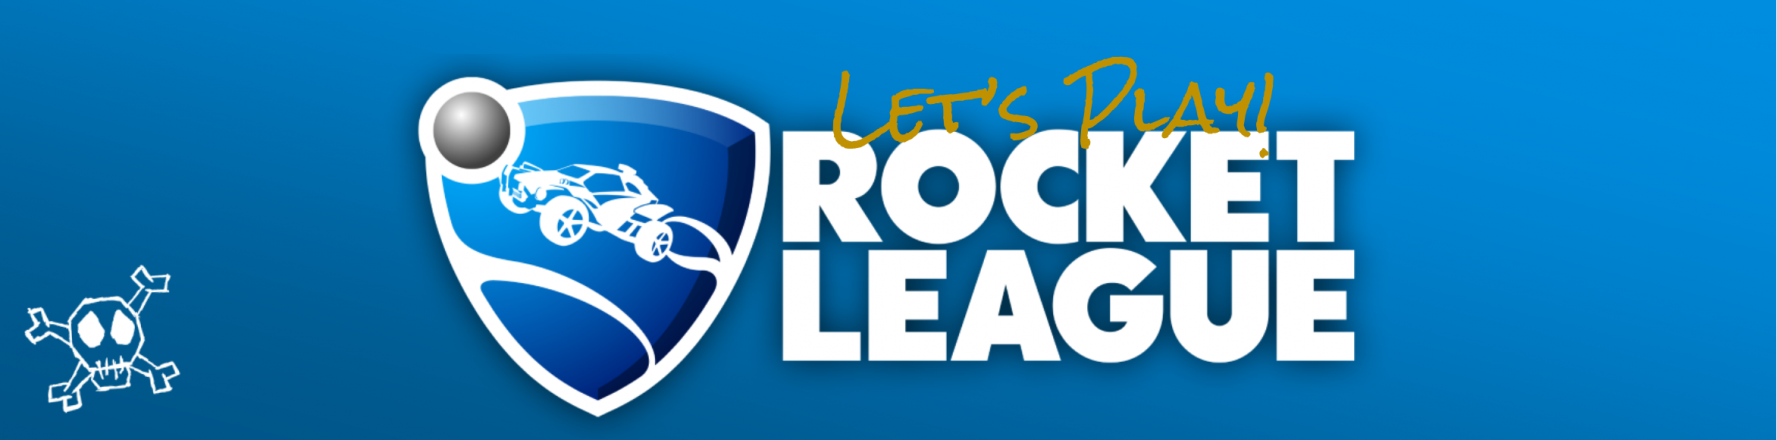 I love Rocket League – I'm not great at Rocket League